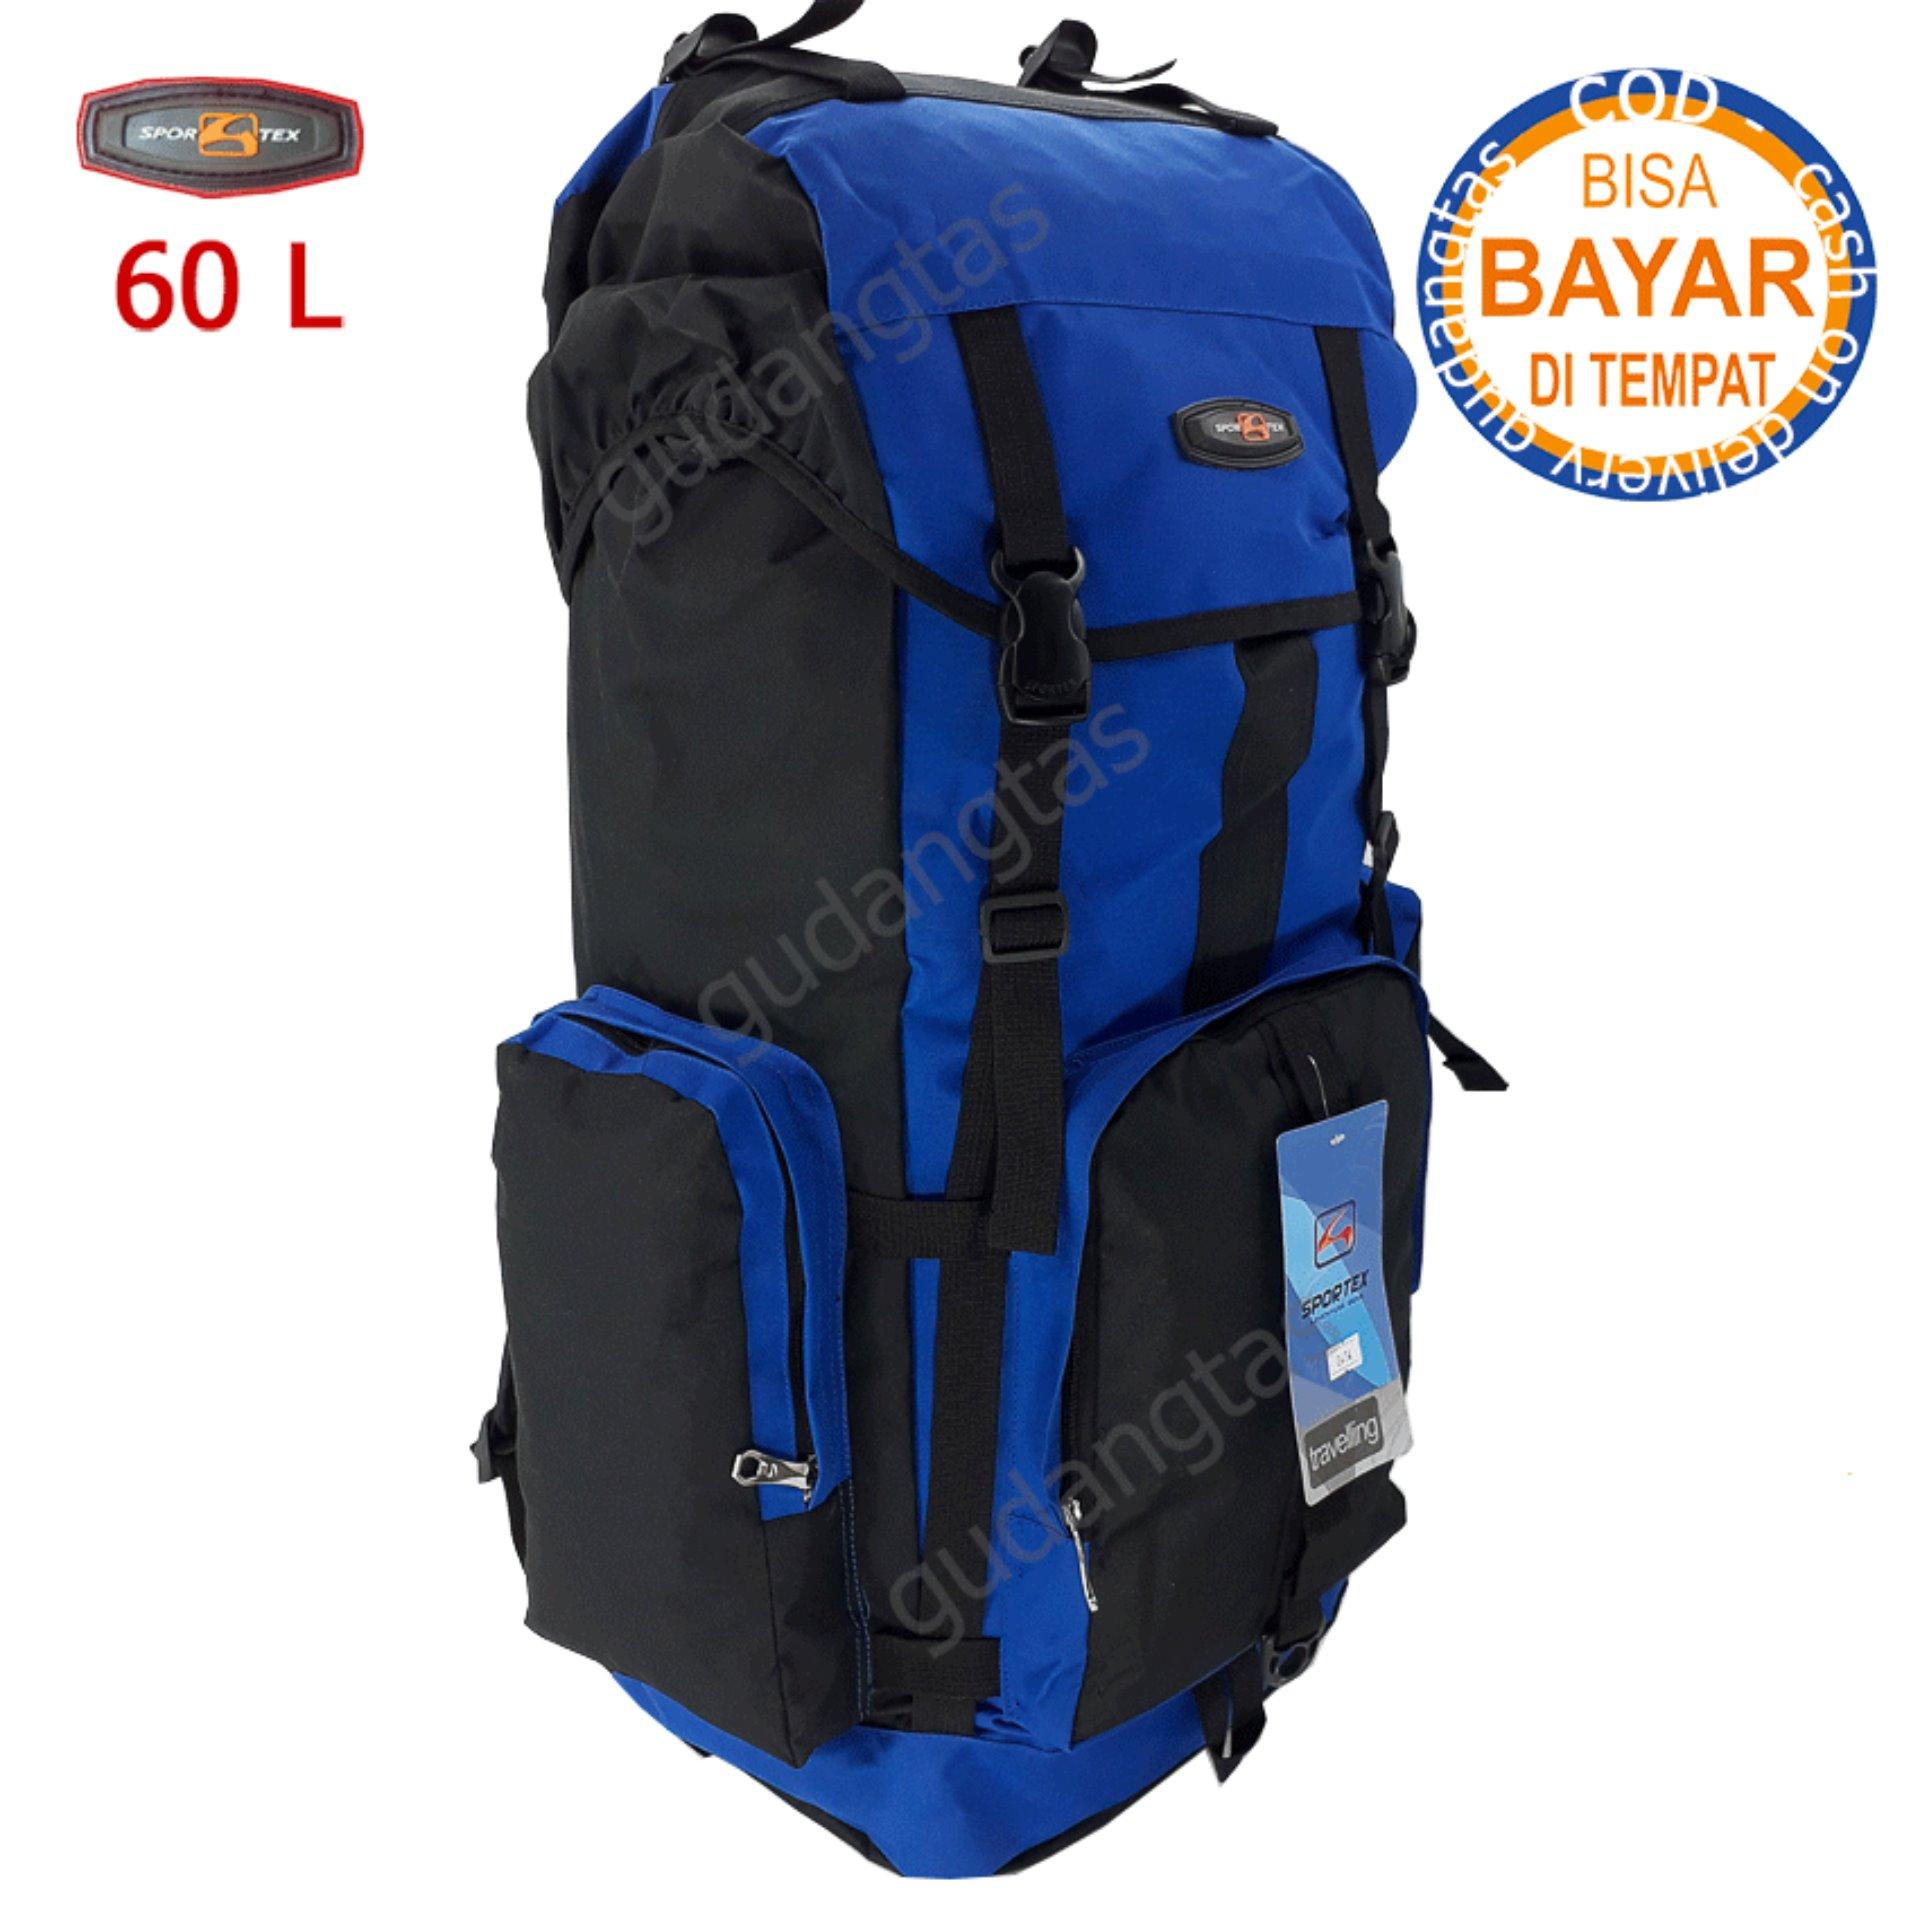 Sportex Tas Gunung Tas Keril Tas Carrier Ransel Camping Tas Hiking 60L 04W4 Biru Terang kombinasi Hitam